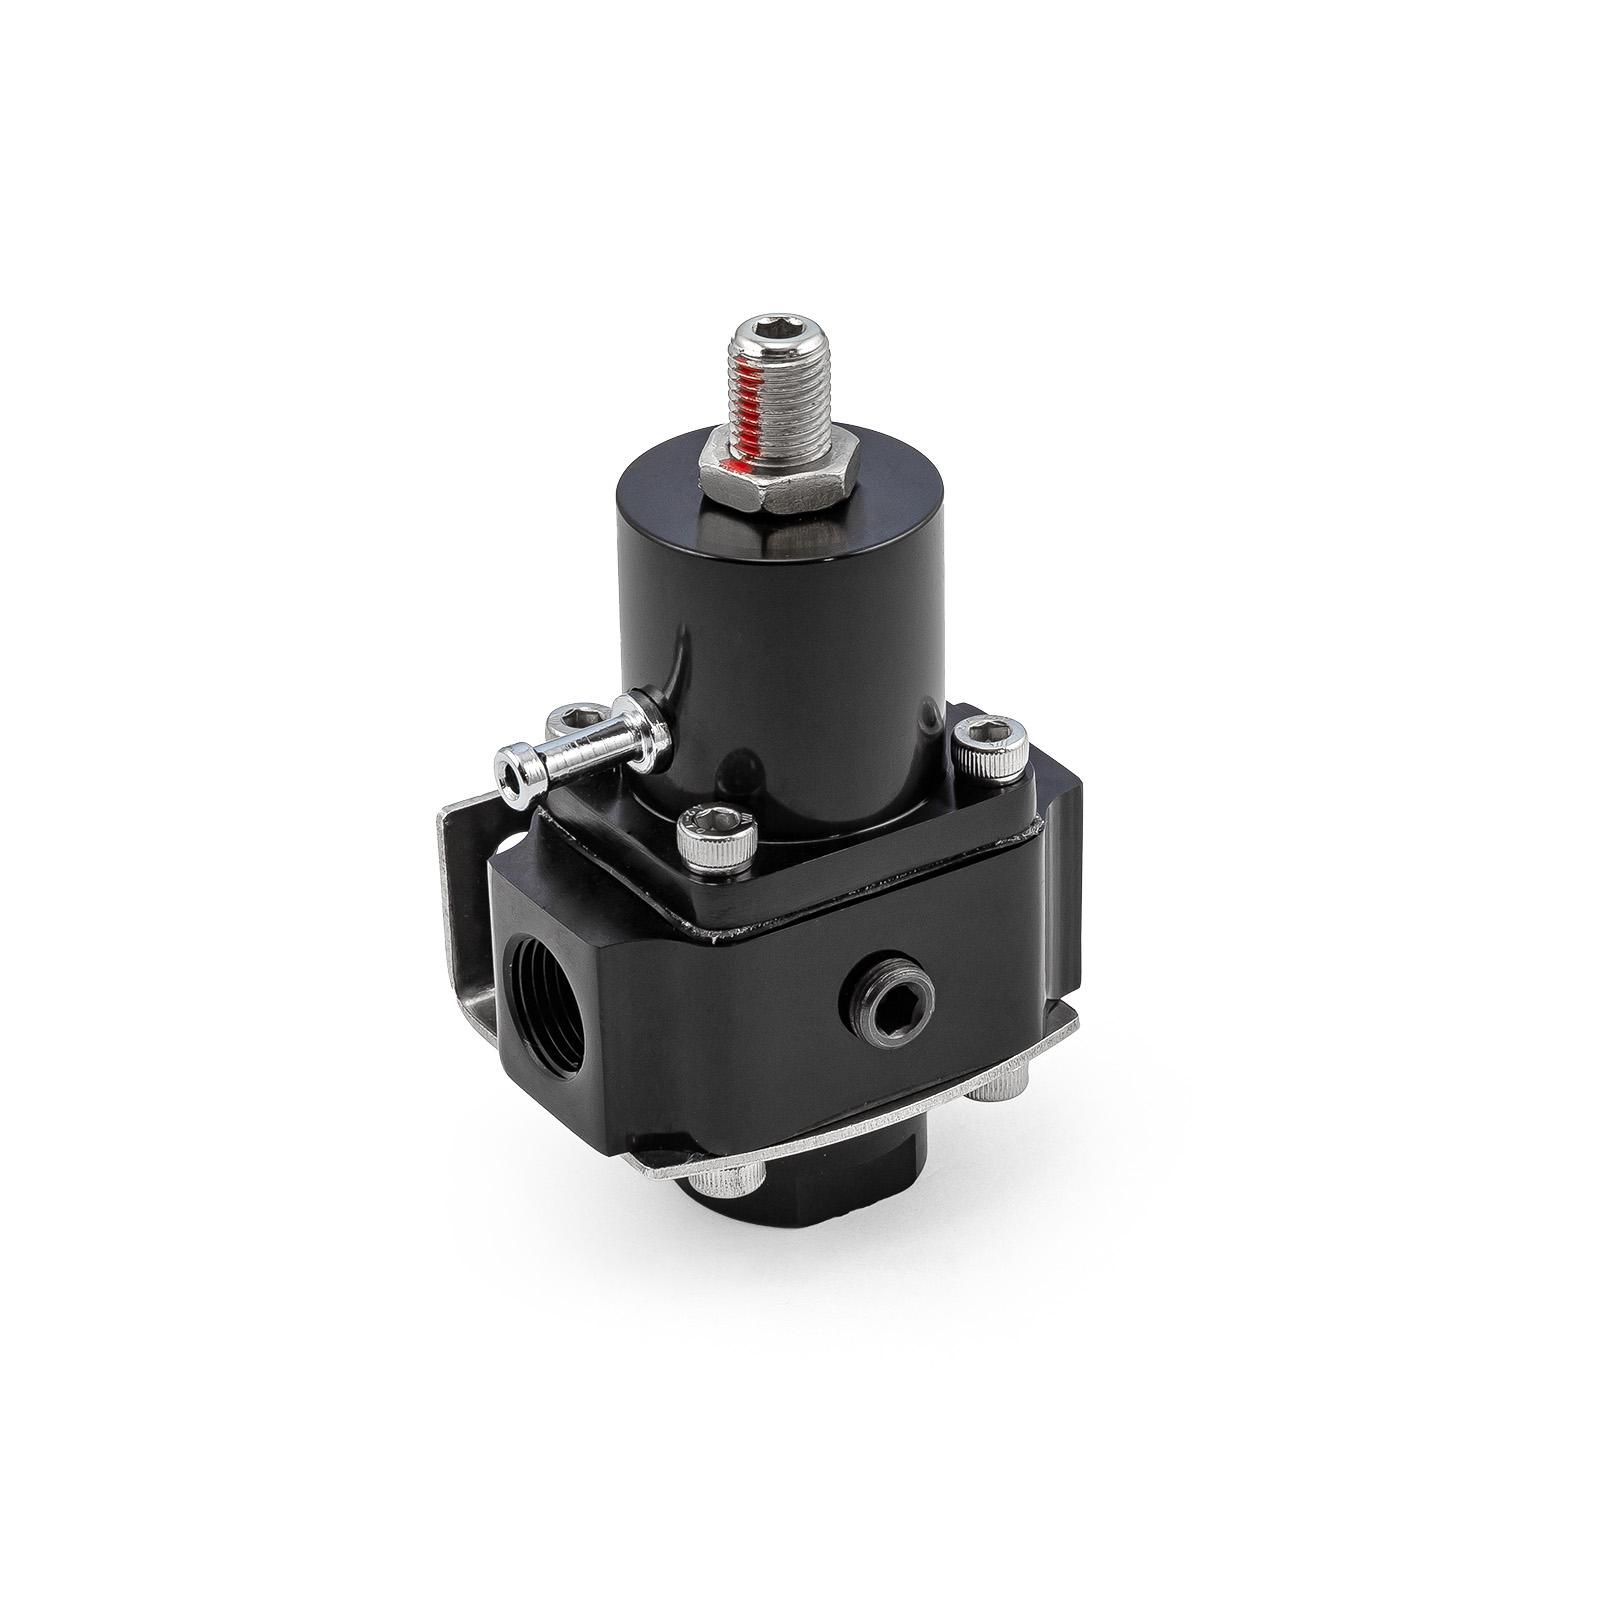 Universal - 10 AN EFI Fuel Pressure Regulator Black